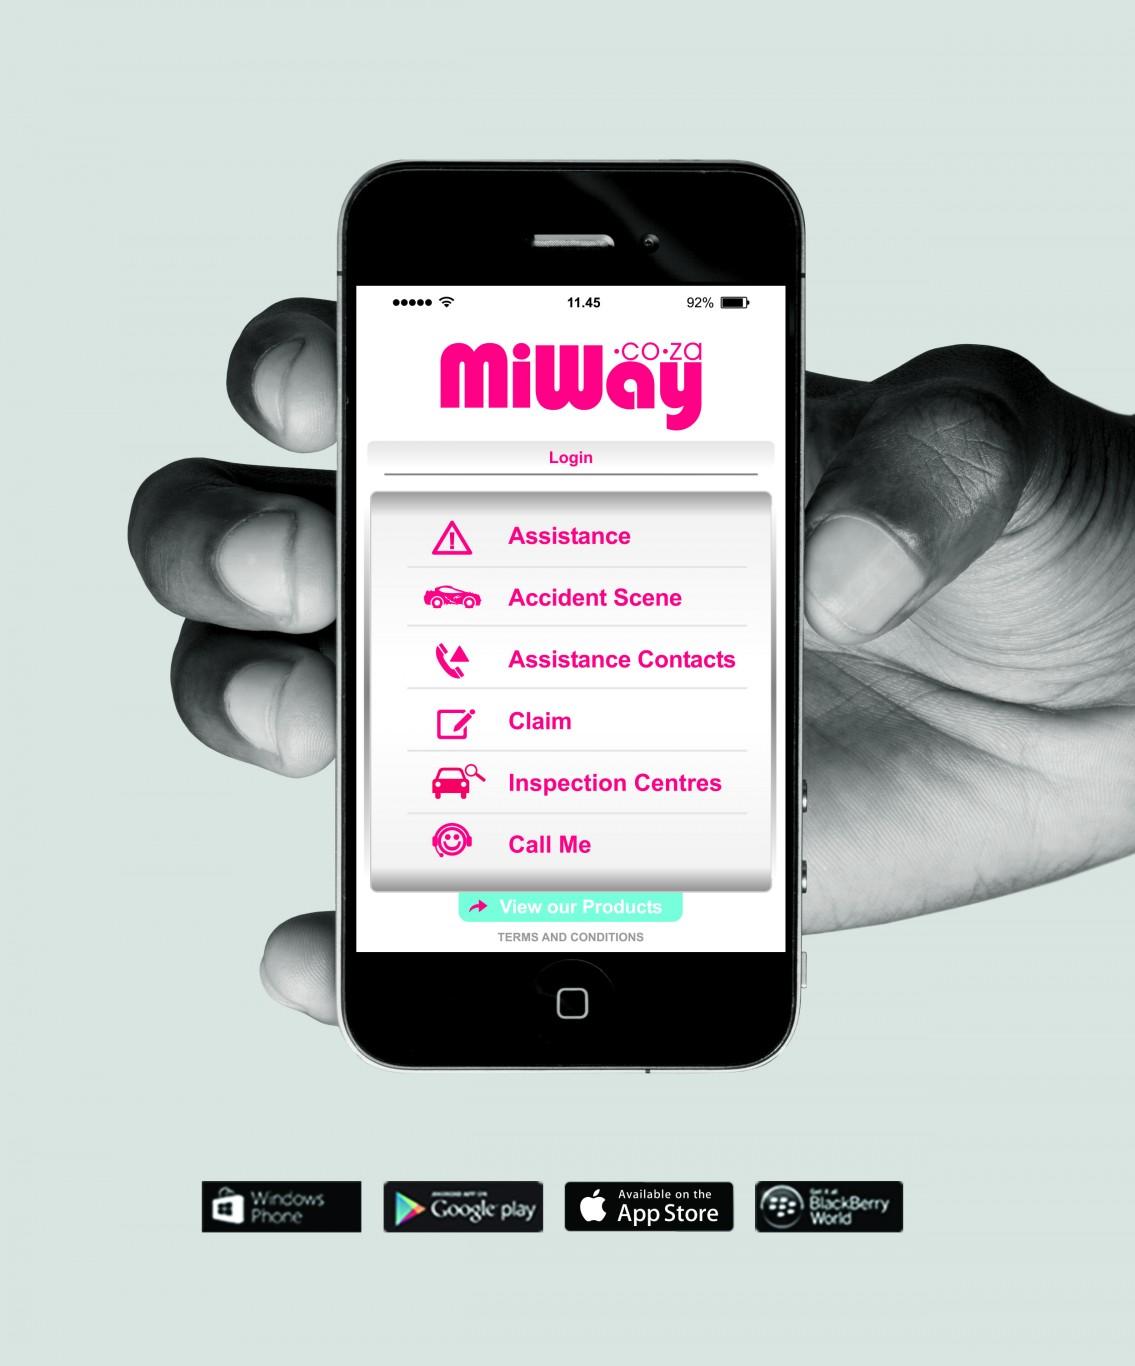 Miway Car Insurance Claim